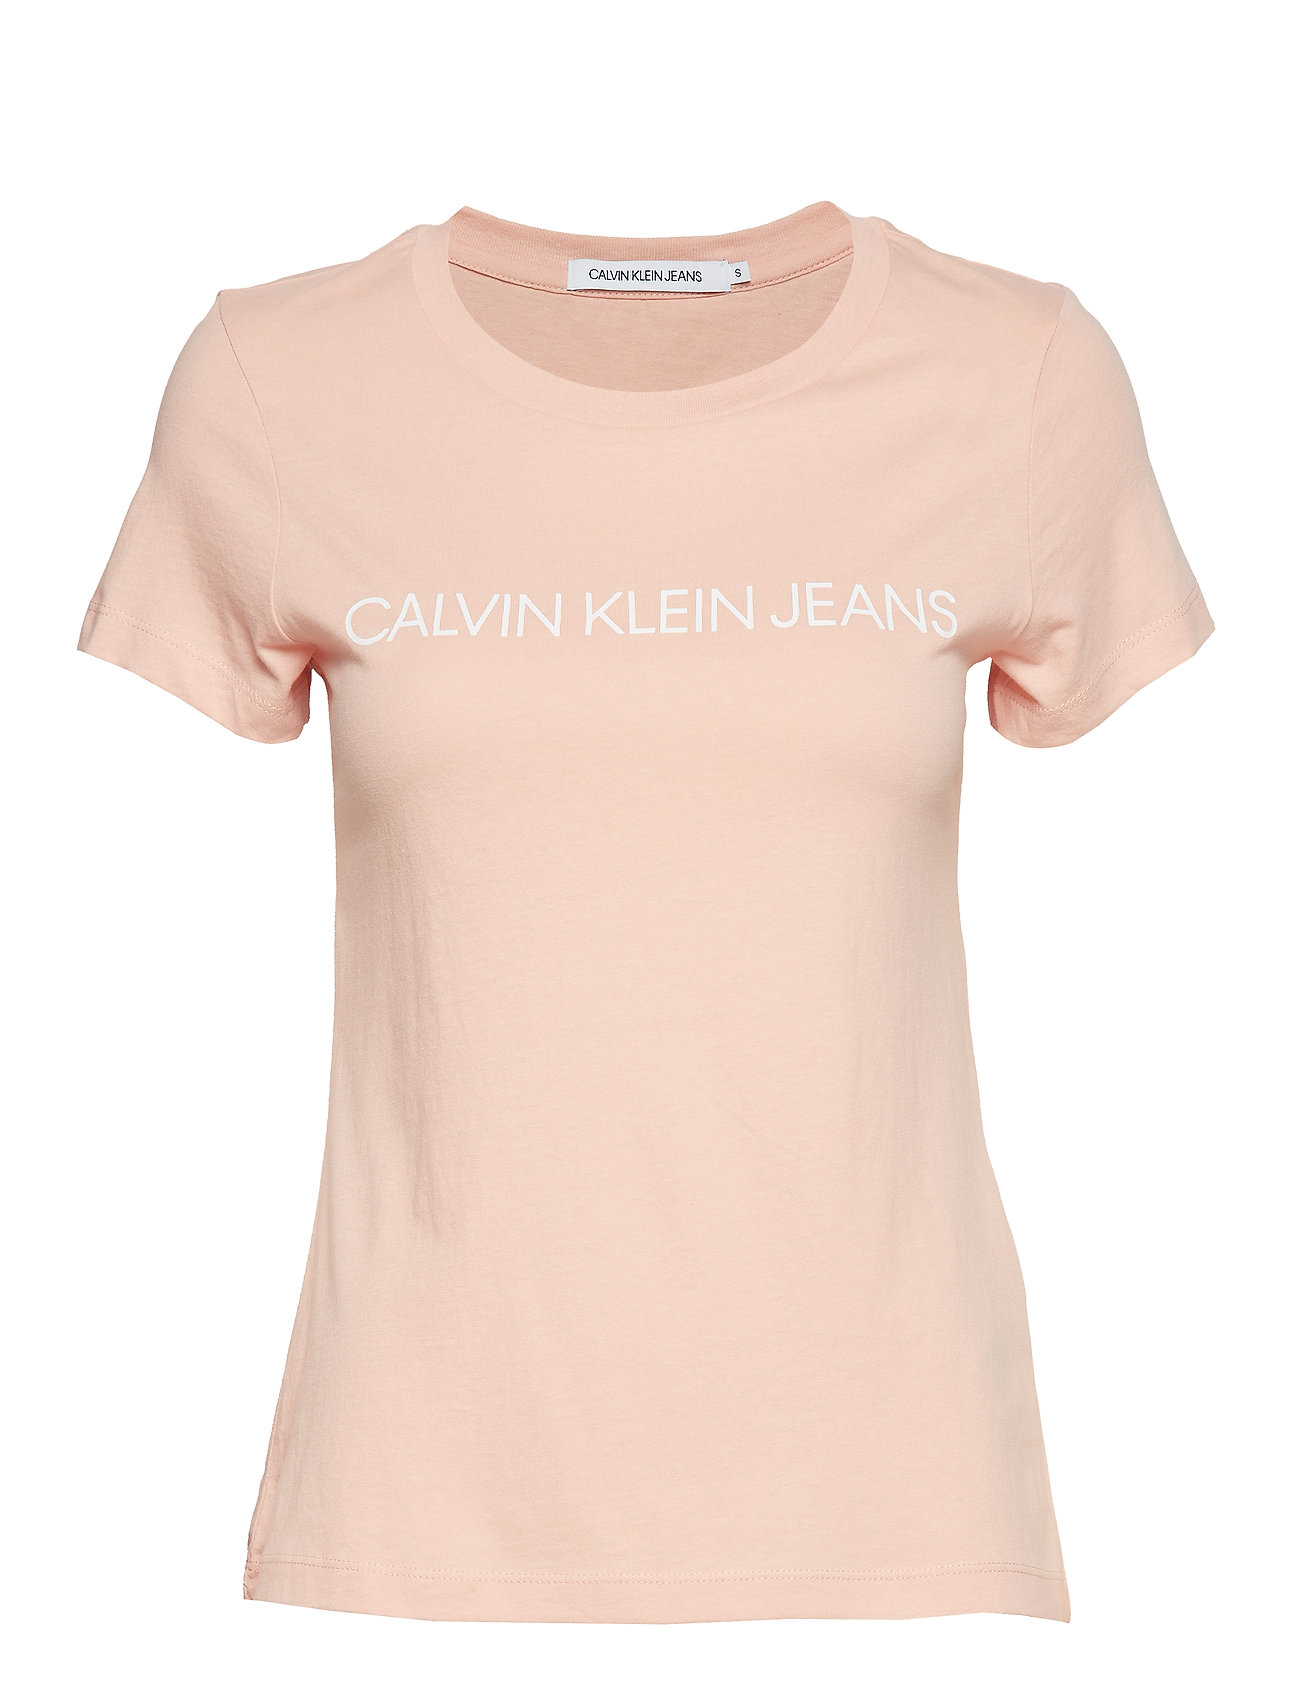 Calvin Klein Jeans INSTITUTIONAL LOGO SLIM FIT TEE - BLOSSOM/ BRIGHT WHITE